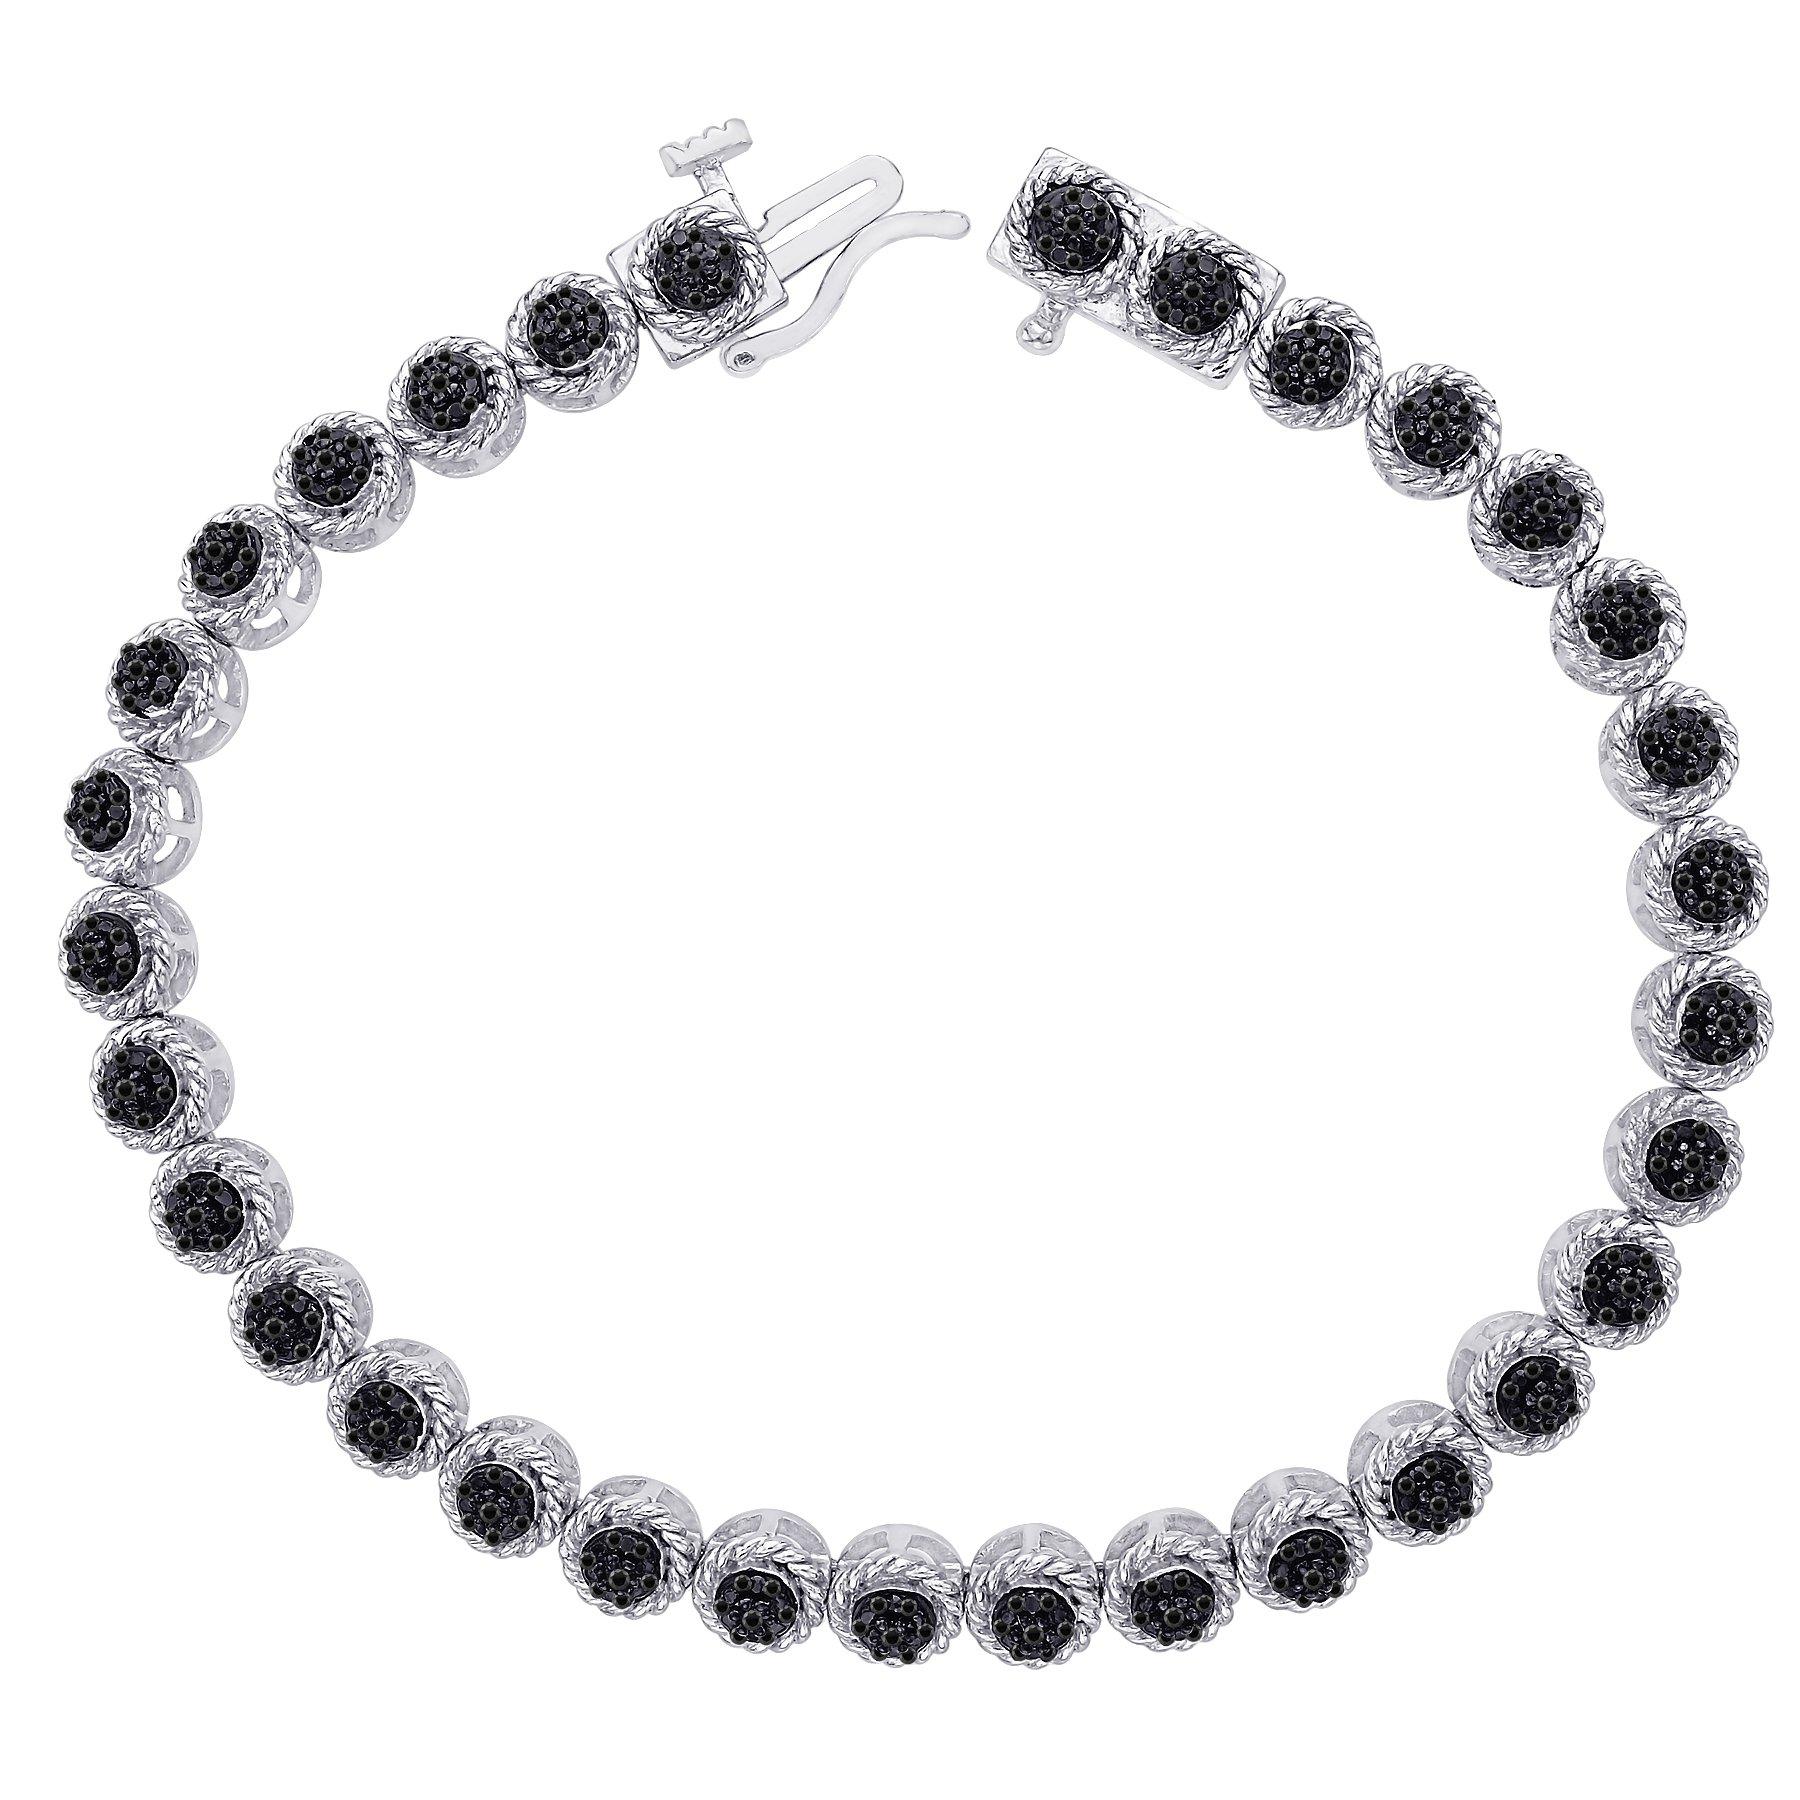 Black Diamond Tennis Bracelet in Sterling Silver (1/5 cttw) by KATARINA